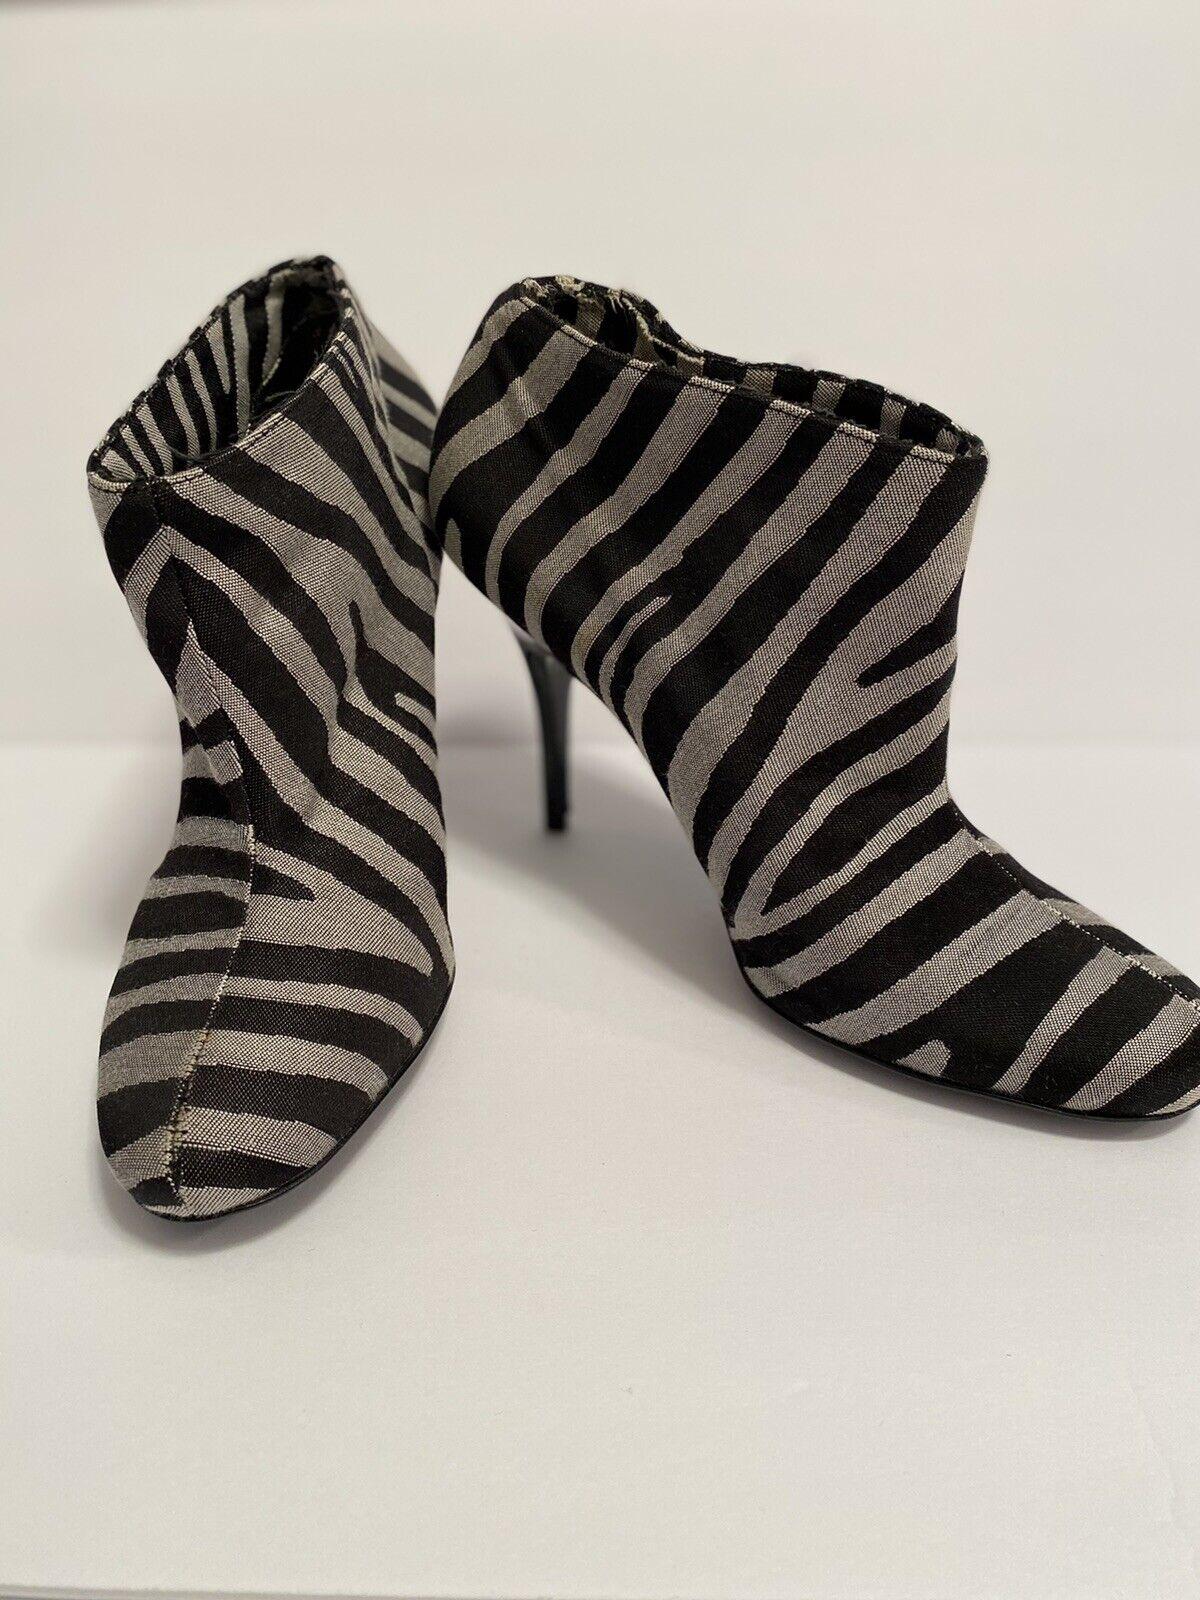 Stella McCartney Zebra Striped Boots Size 36 - image 4